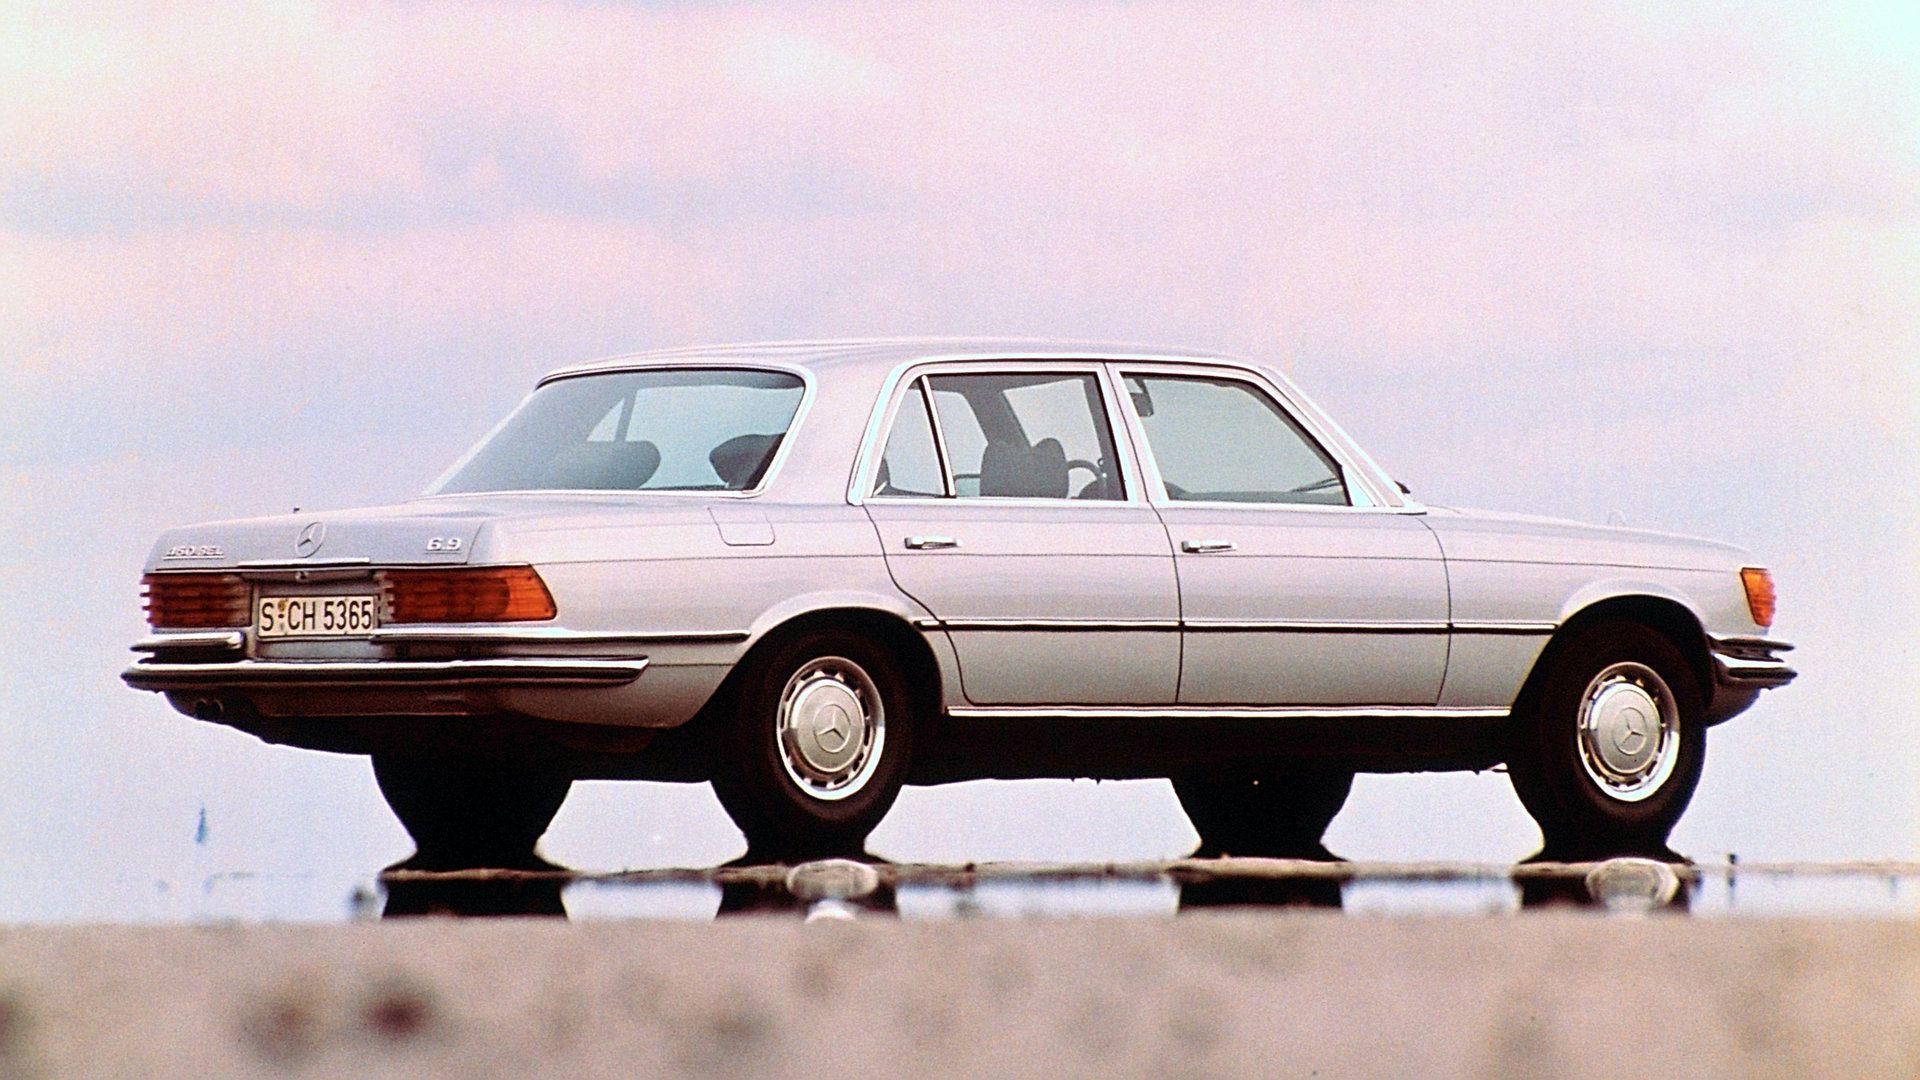 Mercedes Benz 450 SEL 69 W116 7